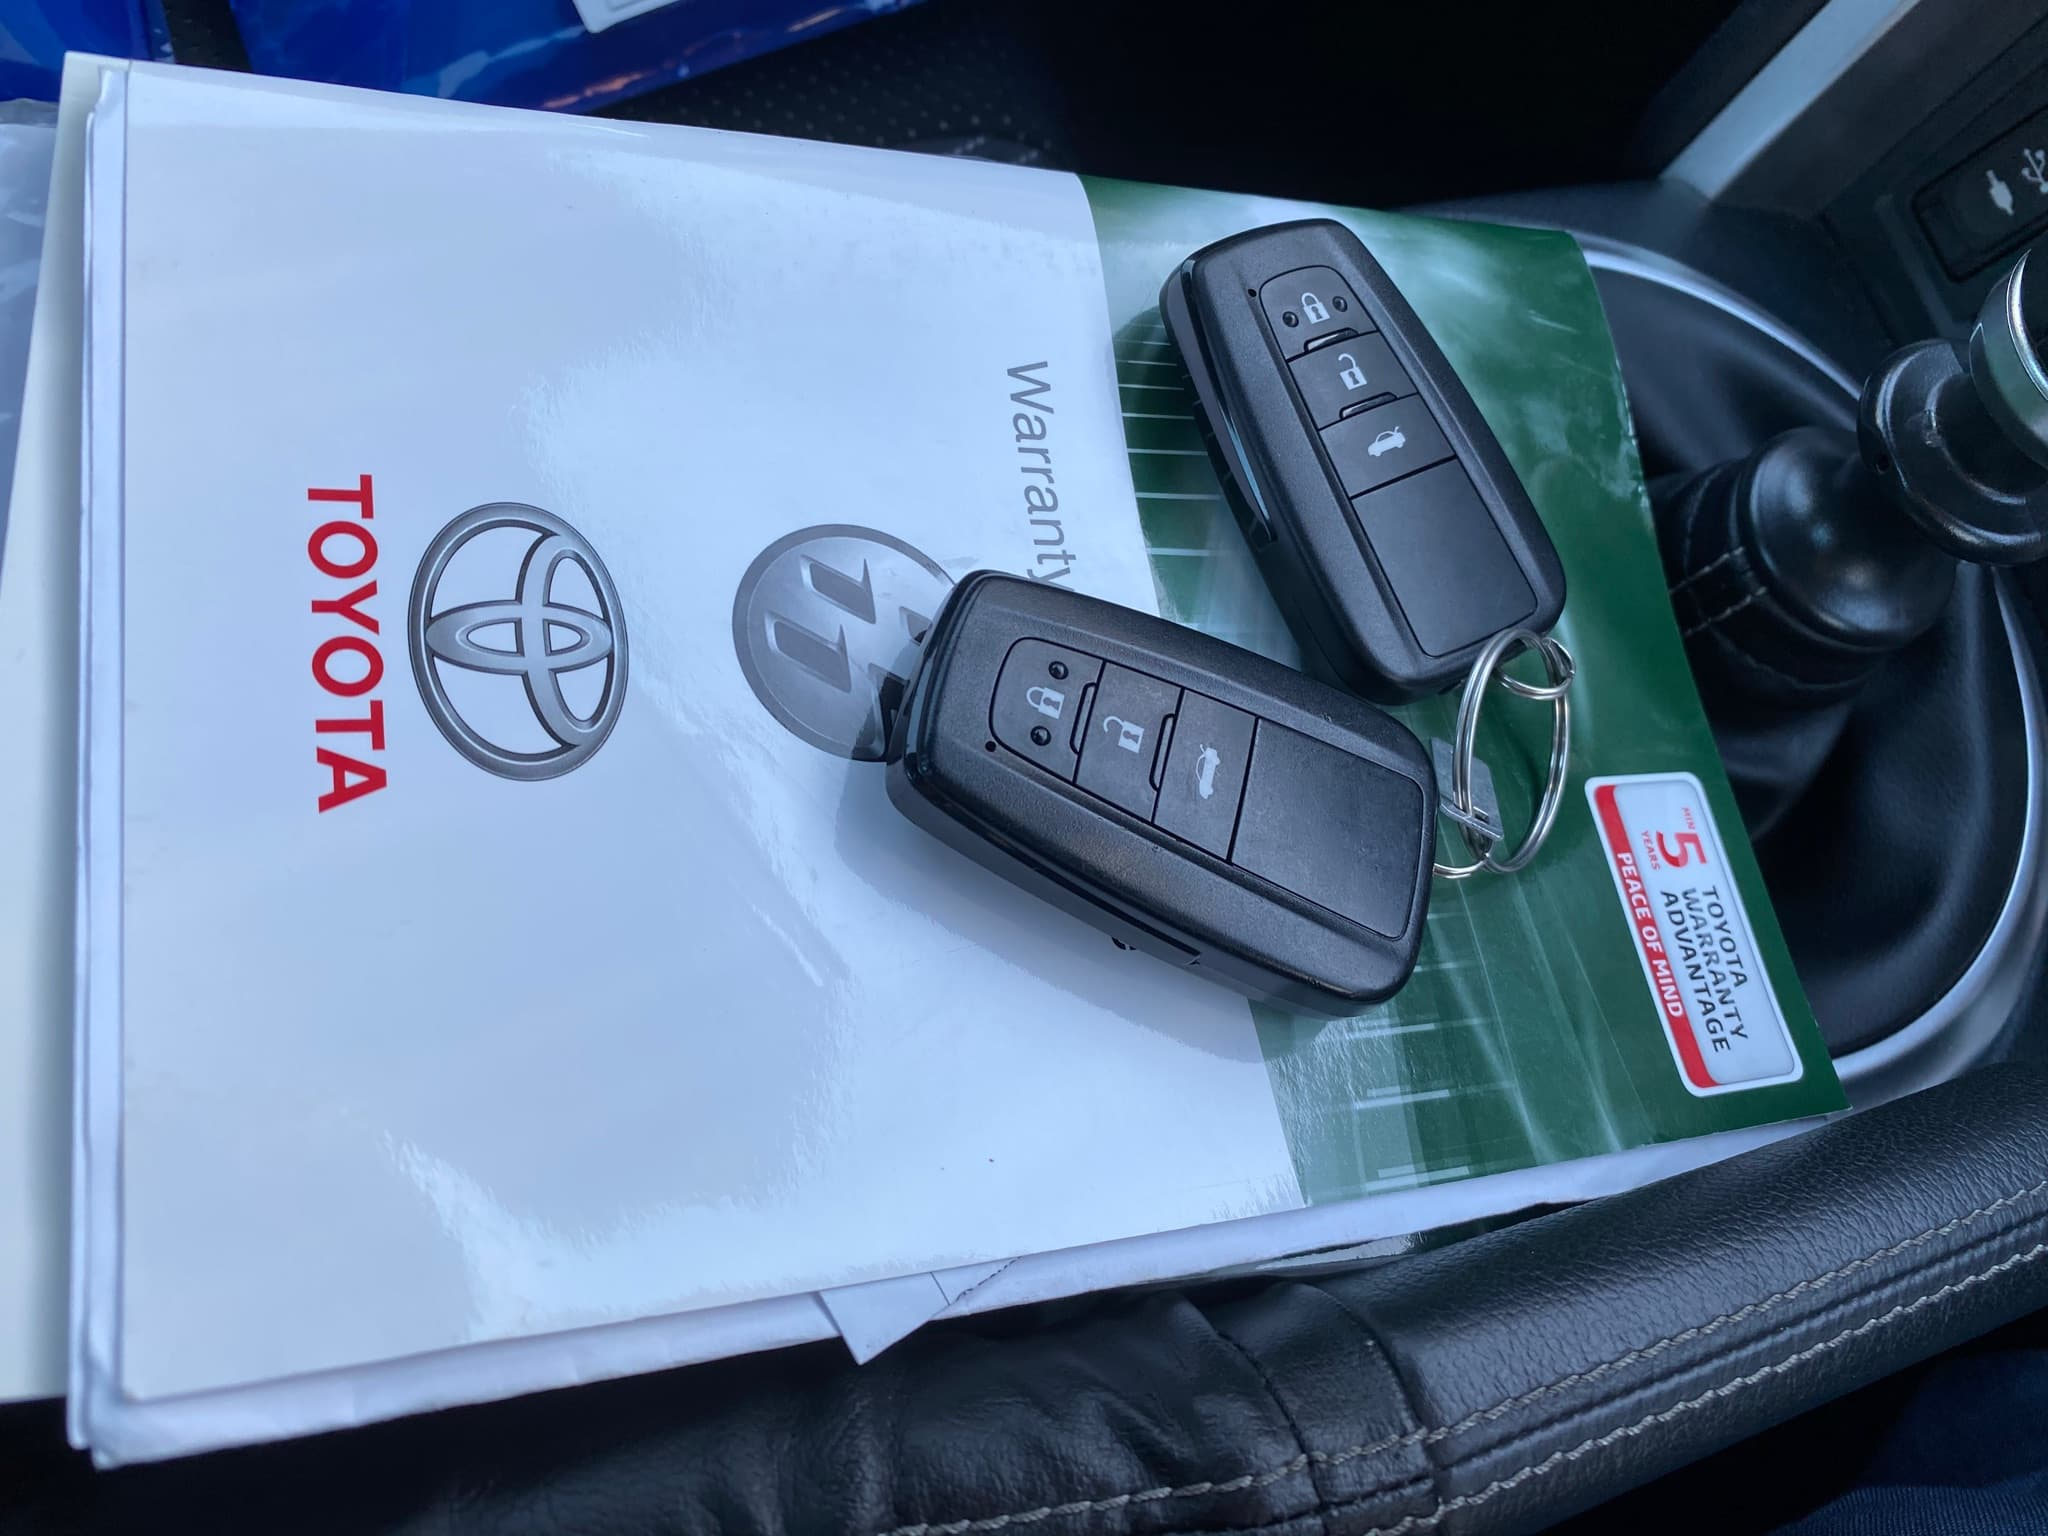 2019 Toyota 86 GTS Manual - image 14